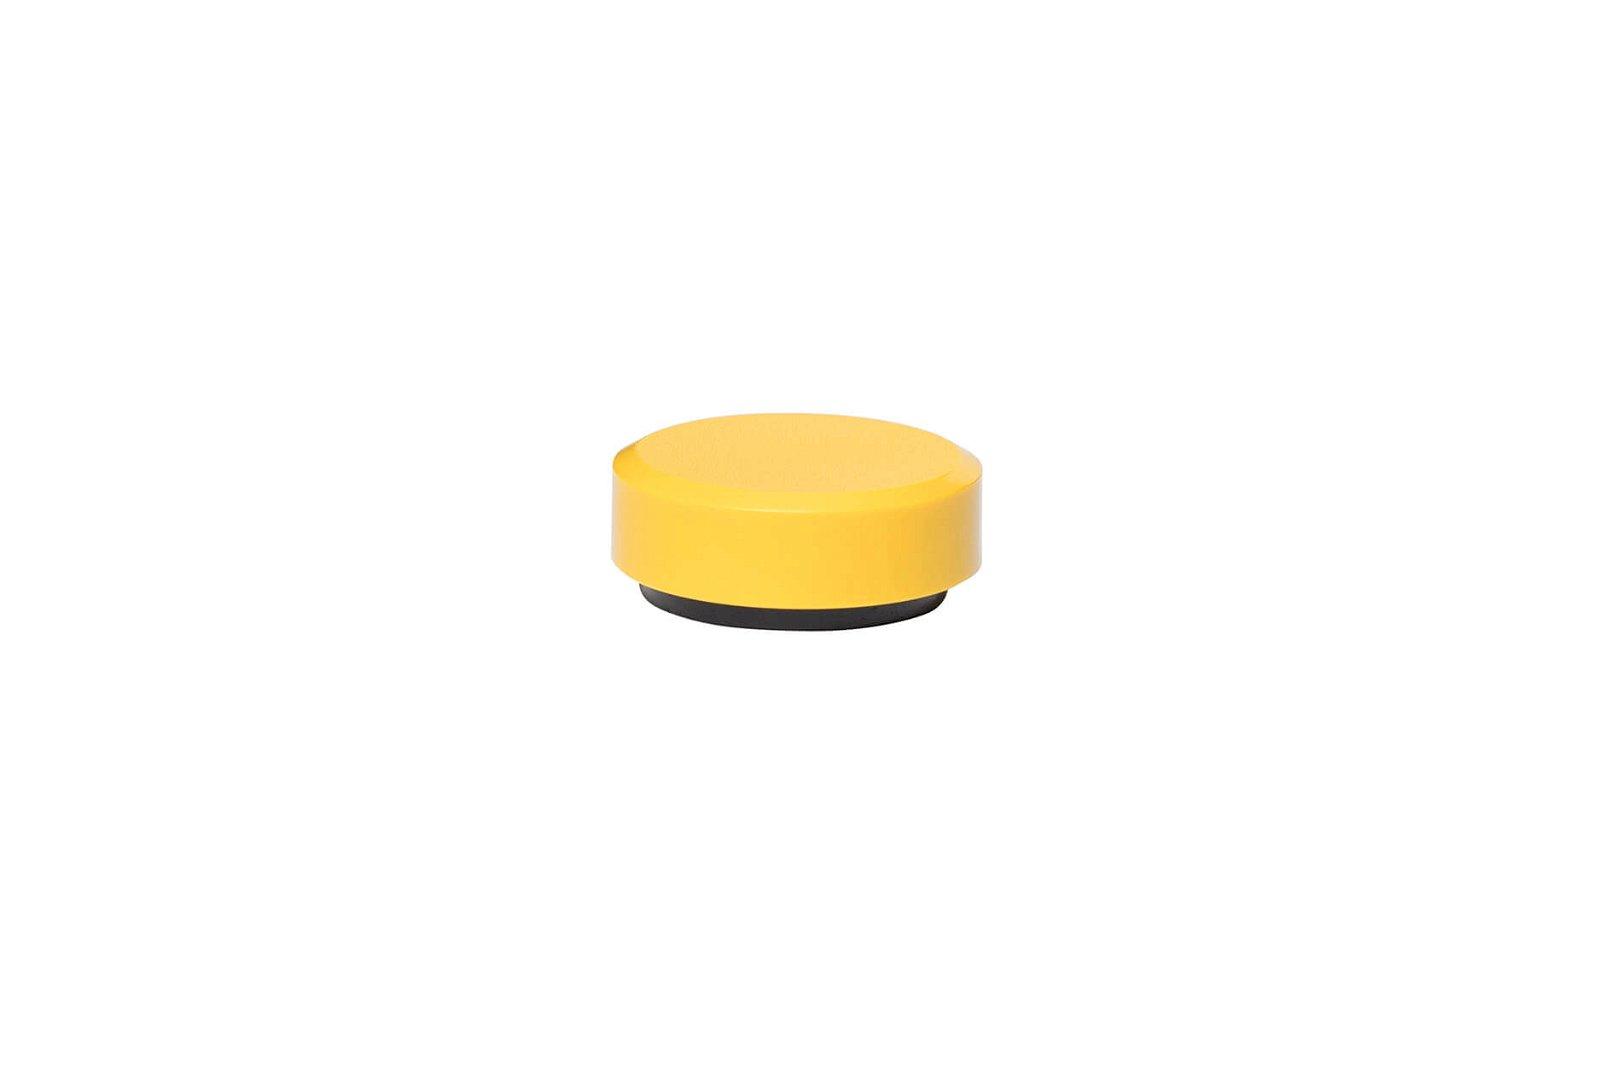 Facetterand-Magnet MAULpro Ø 30 mm, 0,6 kg, 20 St./Set, gelb